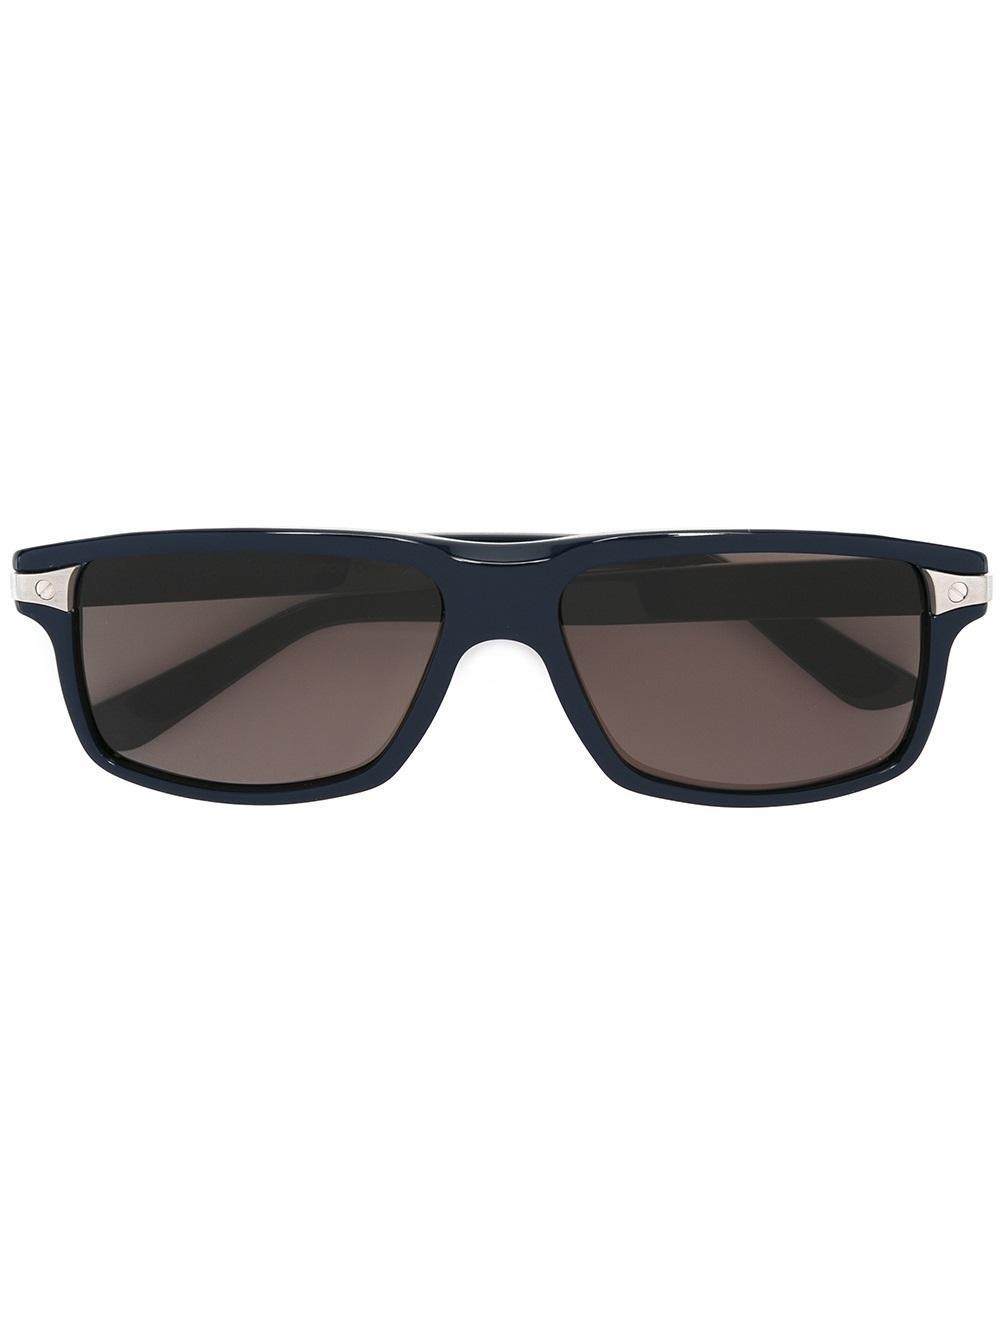 0ea1eae6c4 CARTIER Rimless Gradient Sunglasses 135 22999. Cartier Eyeglasses Glasses  Platinum T8100369 Authentic